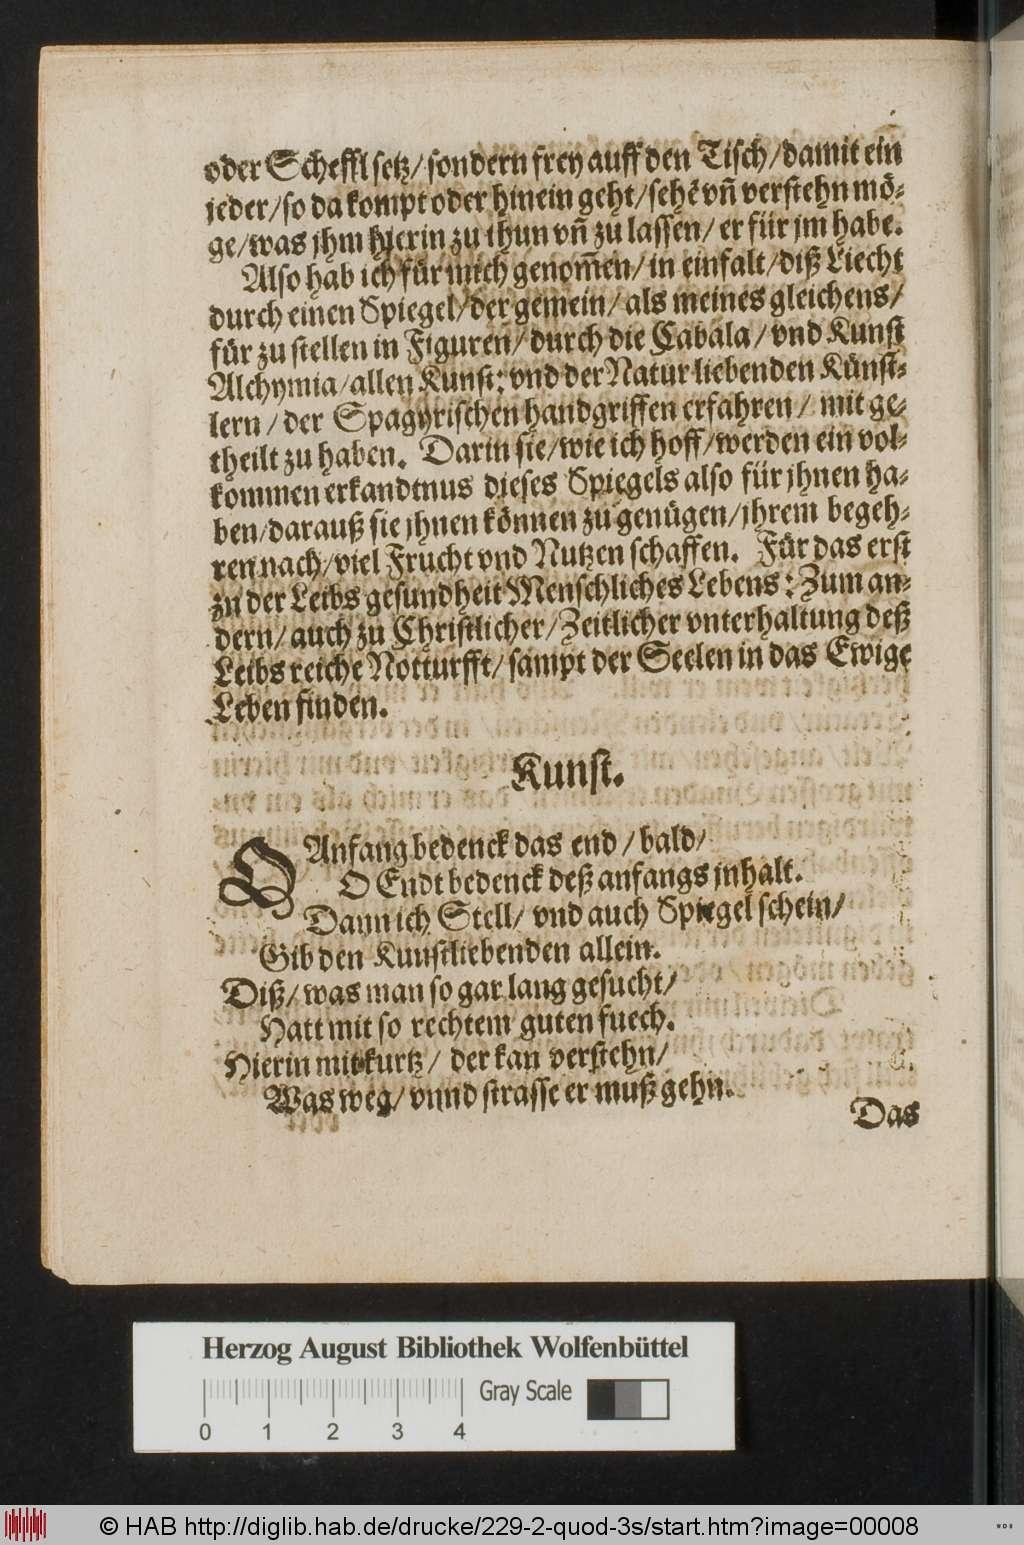 http://diglib.hab.de/drucke/229-2-quod-3s/00008.jpg